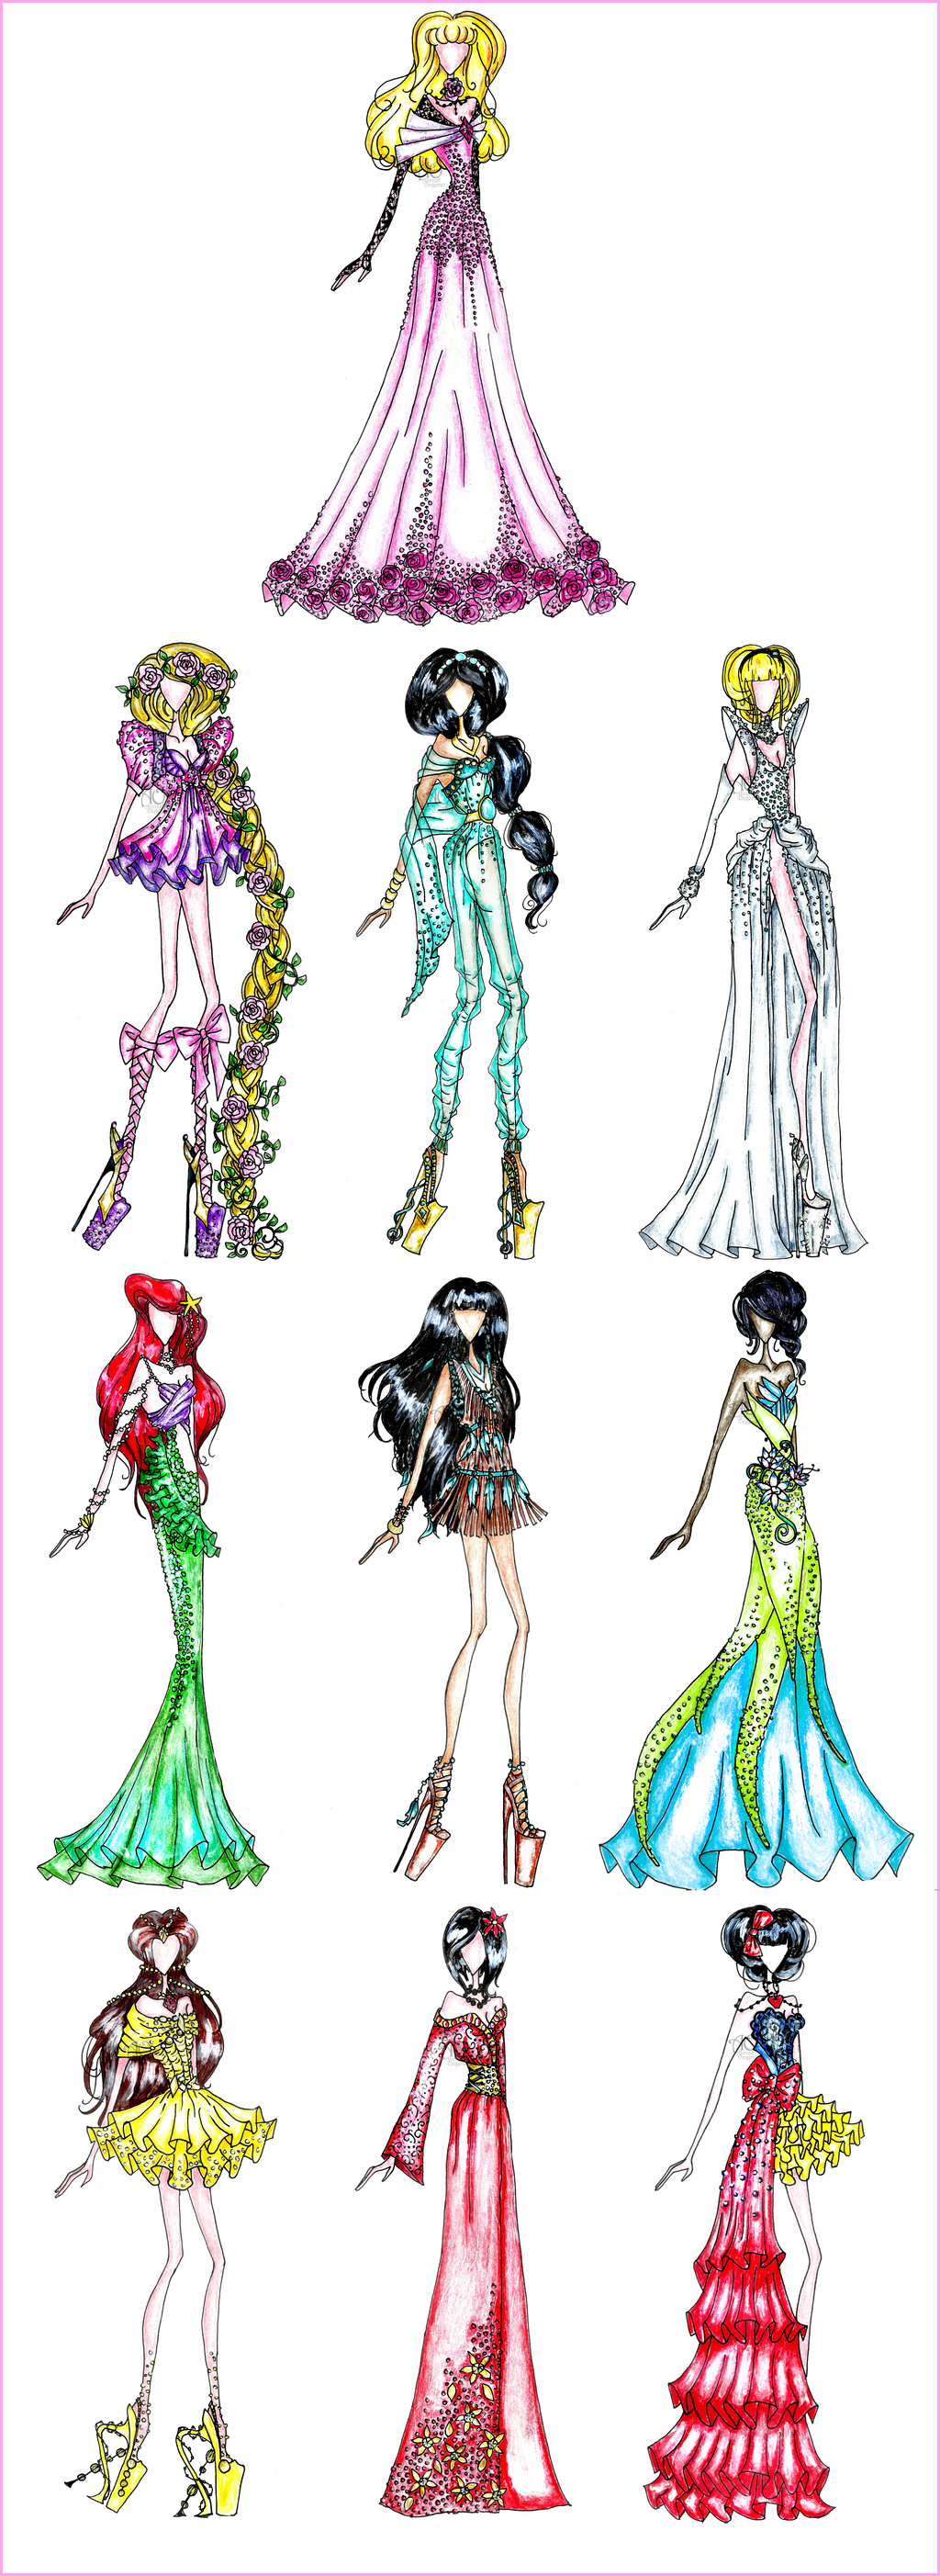 Disney Fashion For Everyone: Disney Princess Fashion By AlirizaDesign On DeviantArt